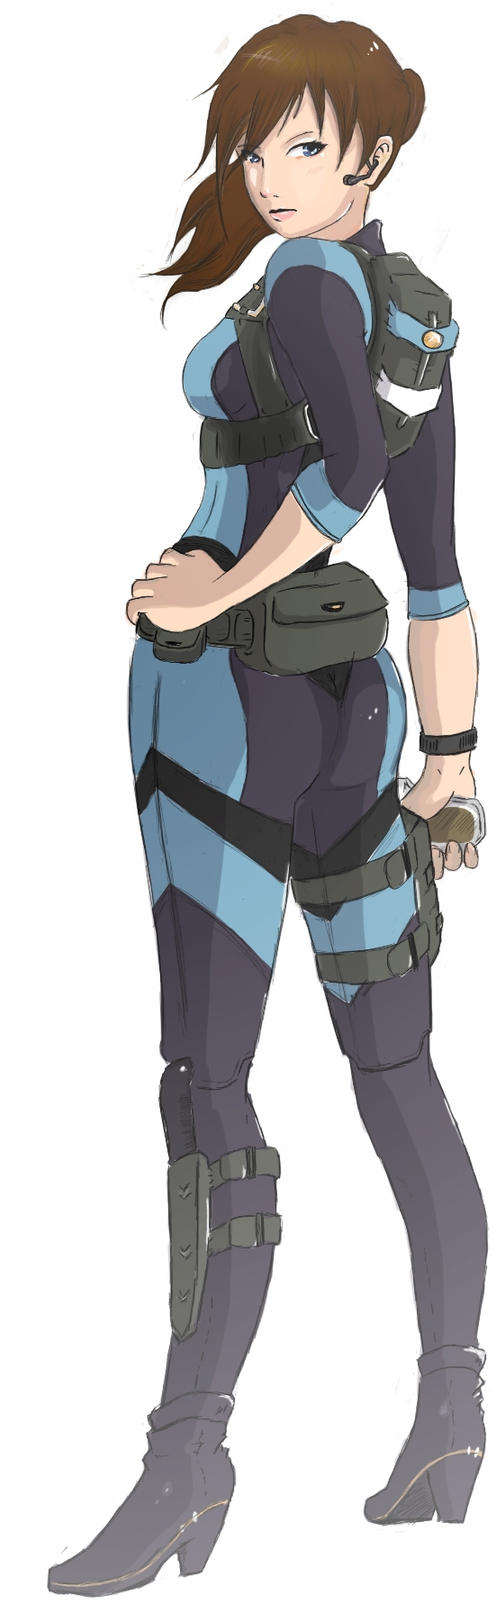 Jill Valentine of Resident evil Revelations by x-Marjou-x